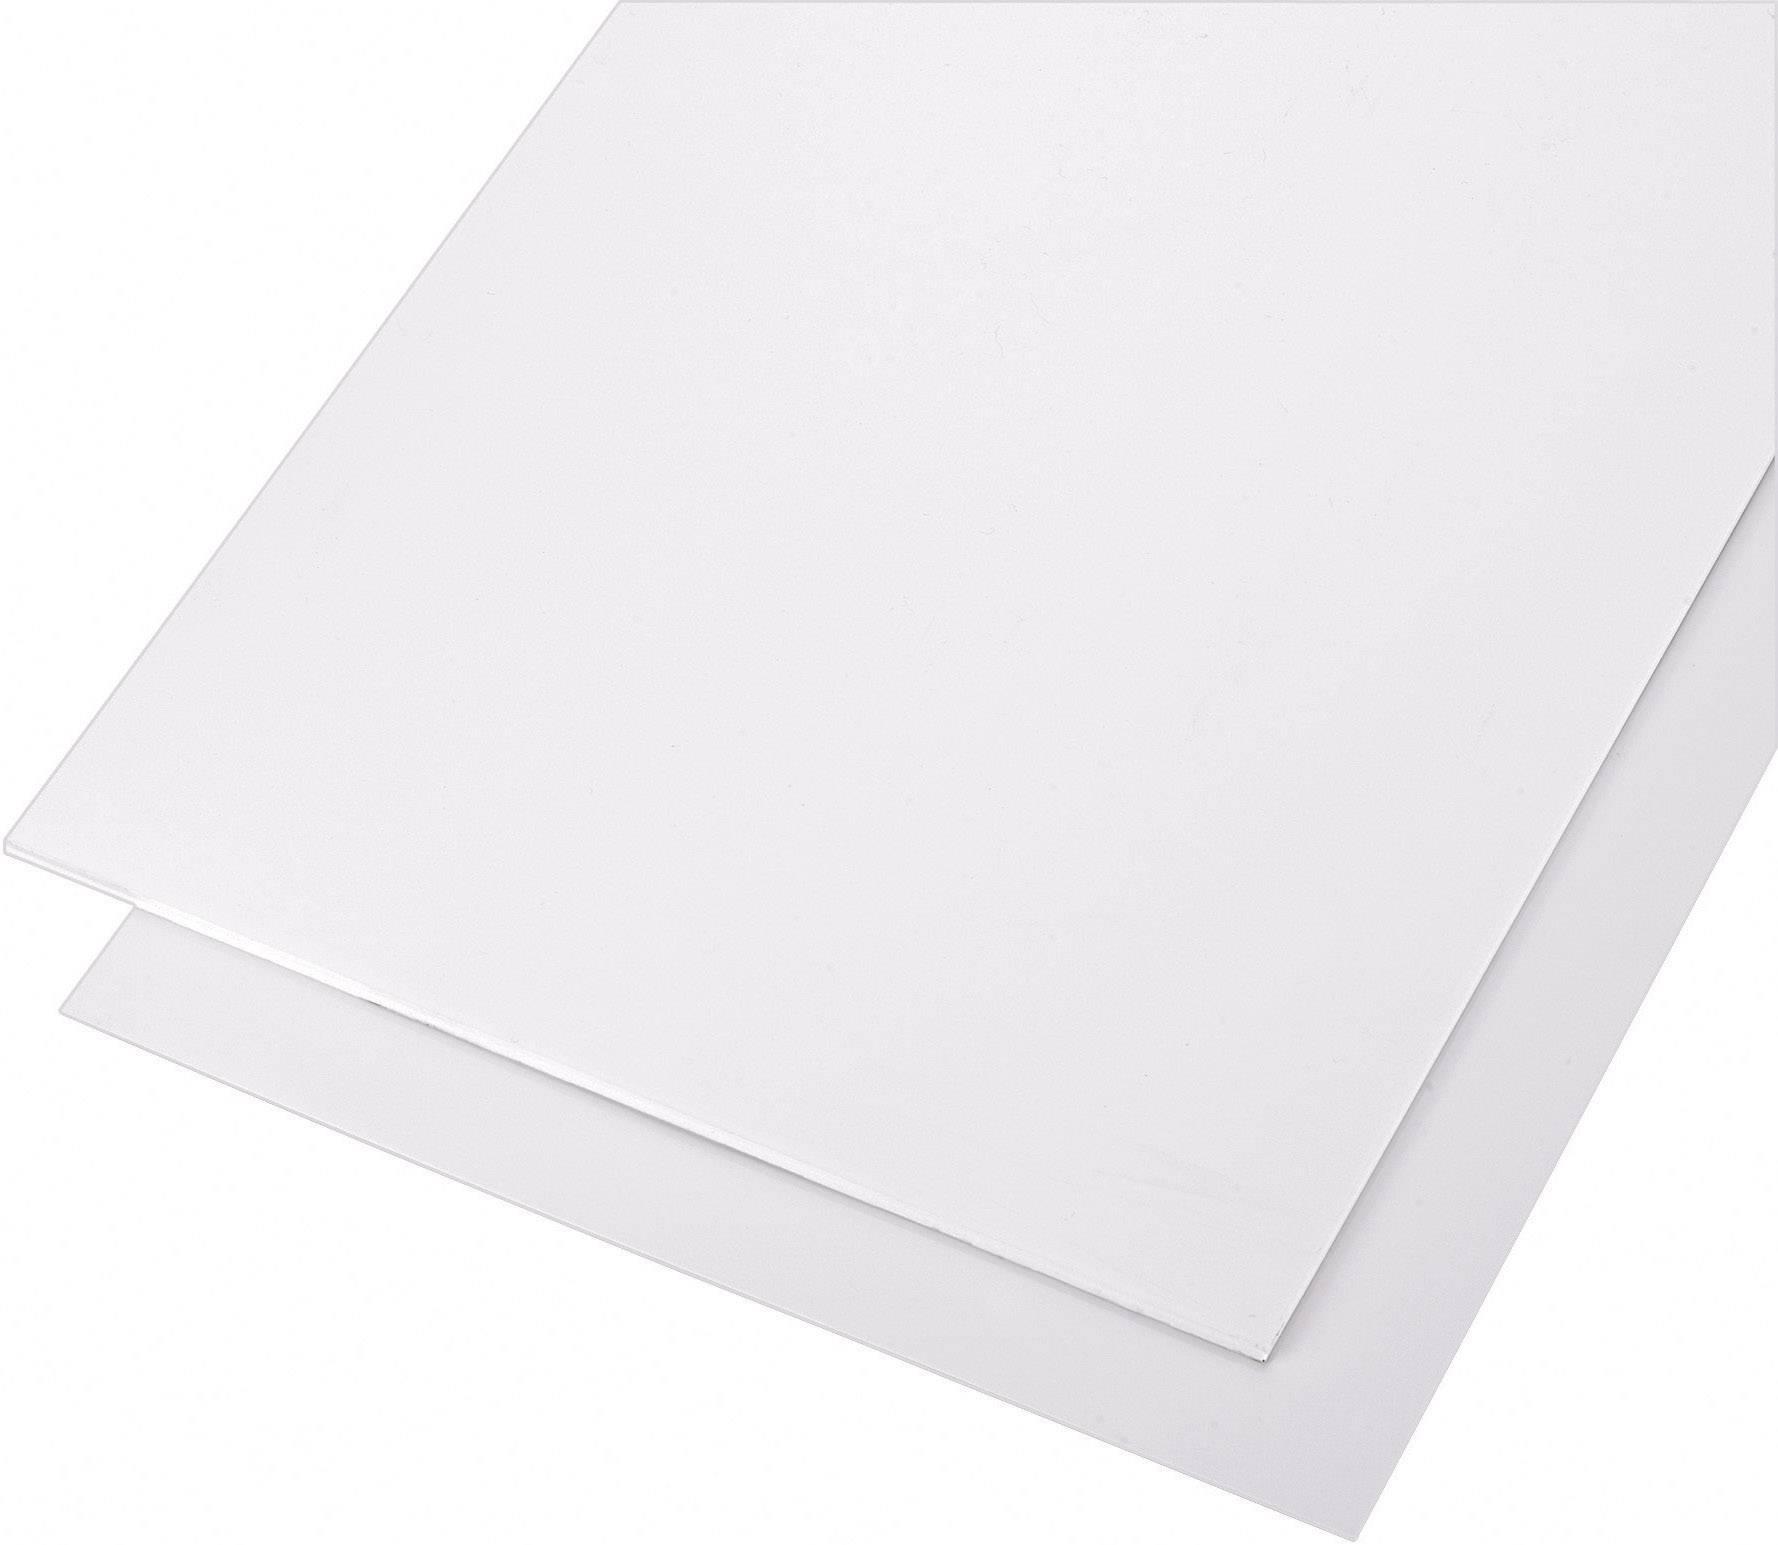 Polystyrenová deska bílá Modelcraft, 330 x 230 x 4 mm